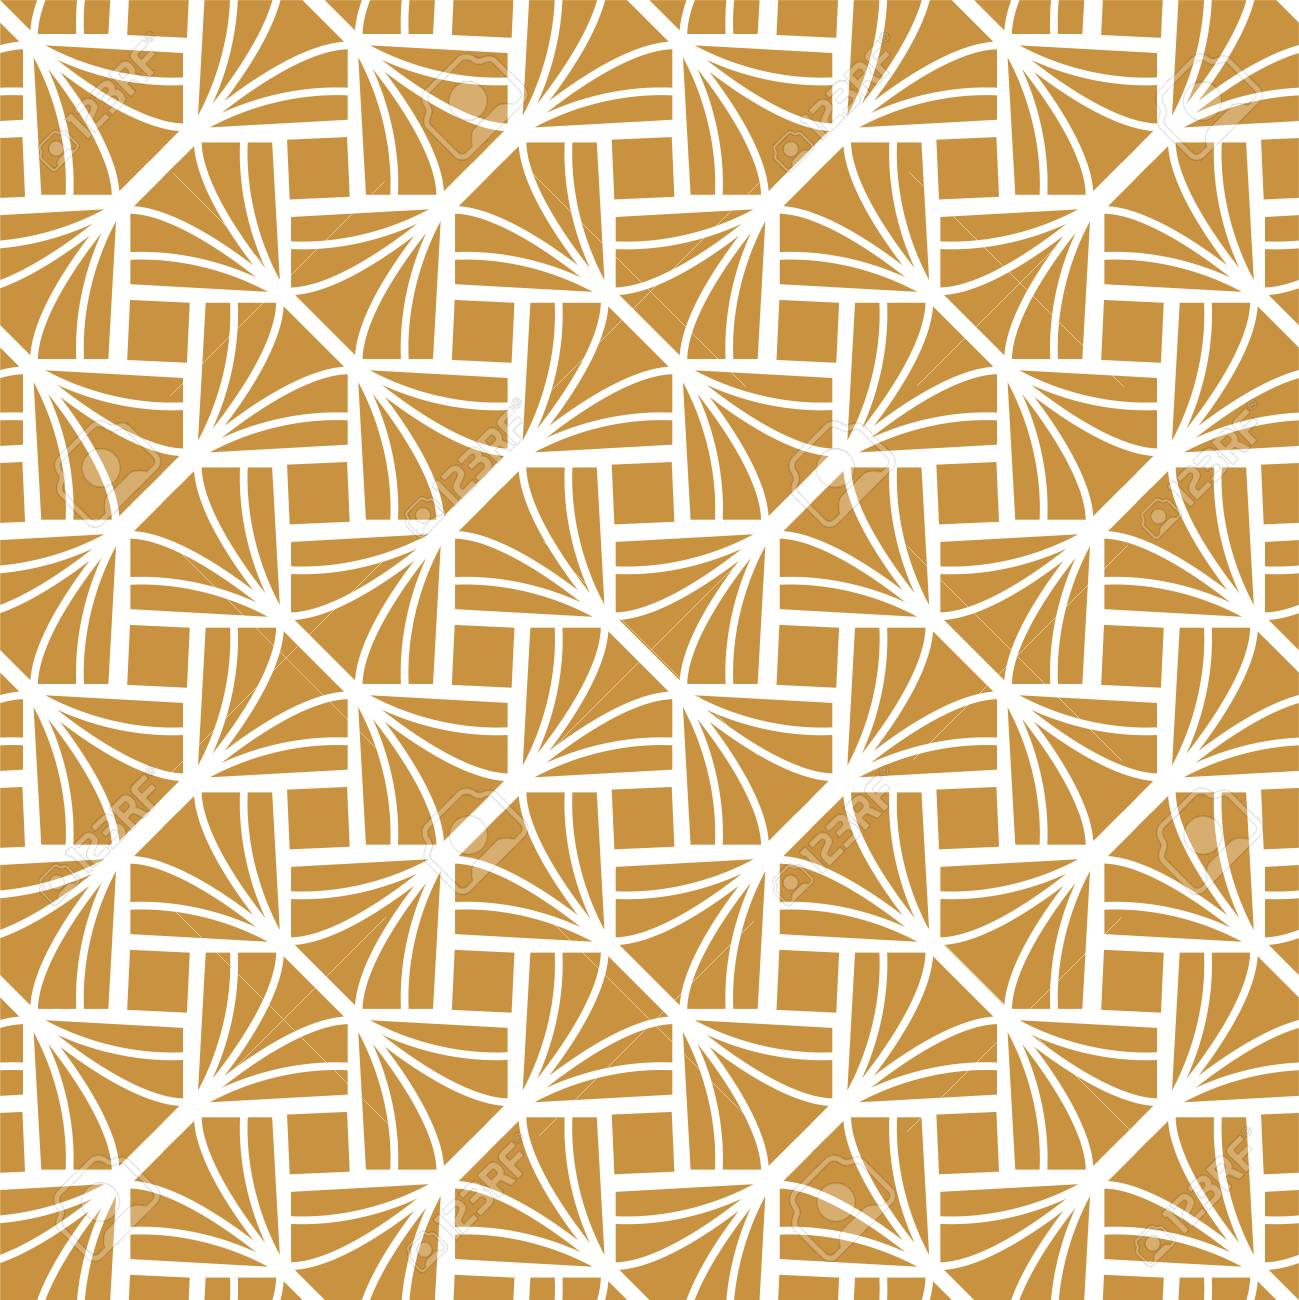 Classic Diamond Art Deco Seamless Pattern. Geometric Stylish Texture. Abstract Retro Vector Texture. - 101707456